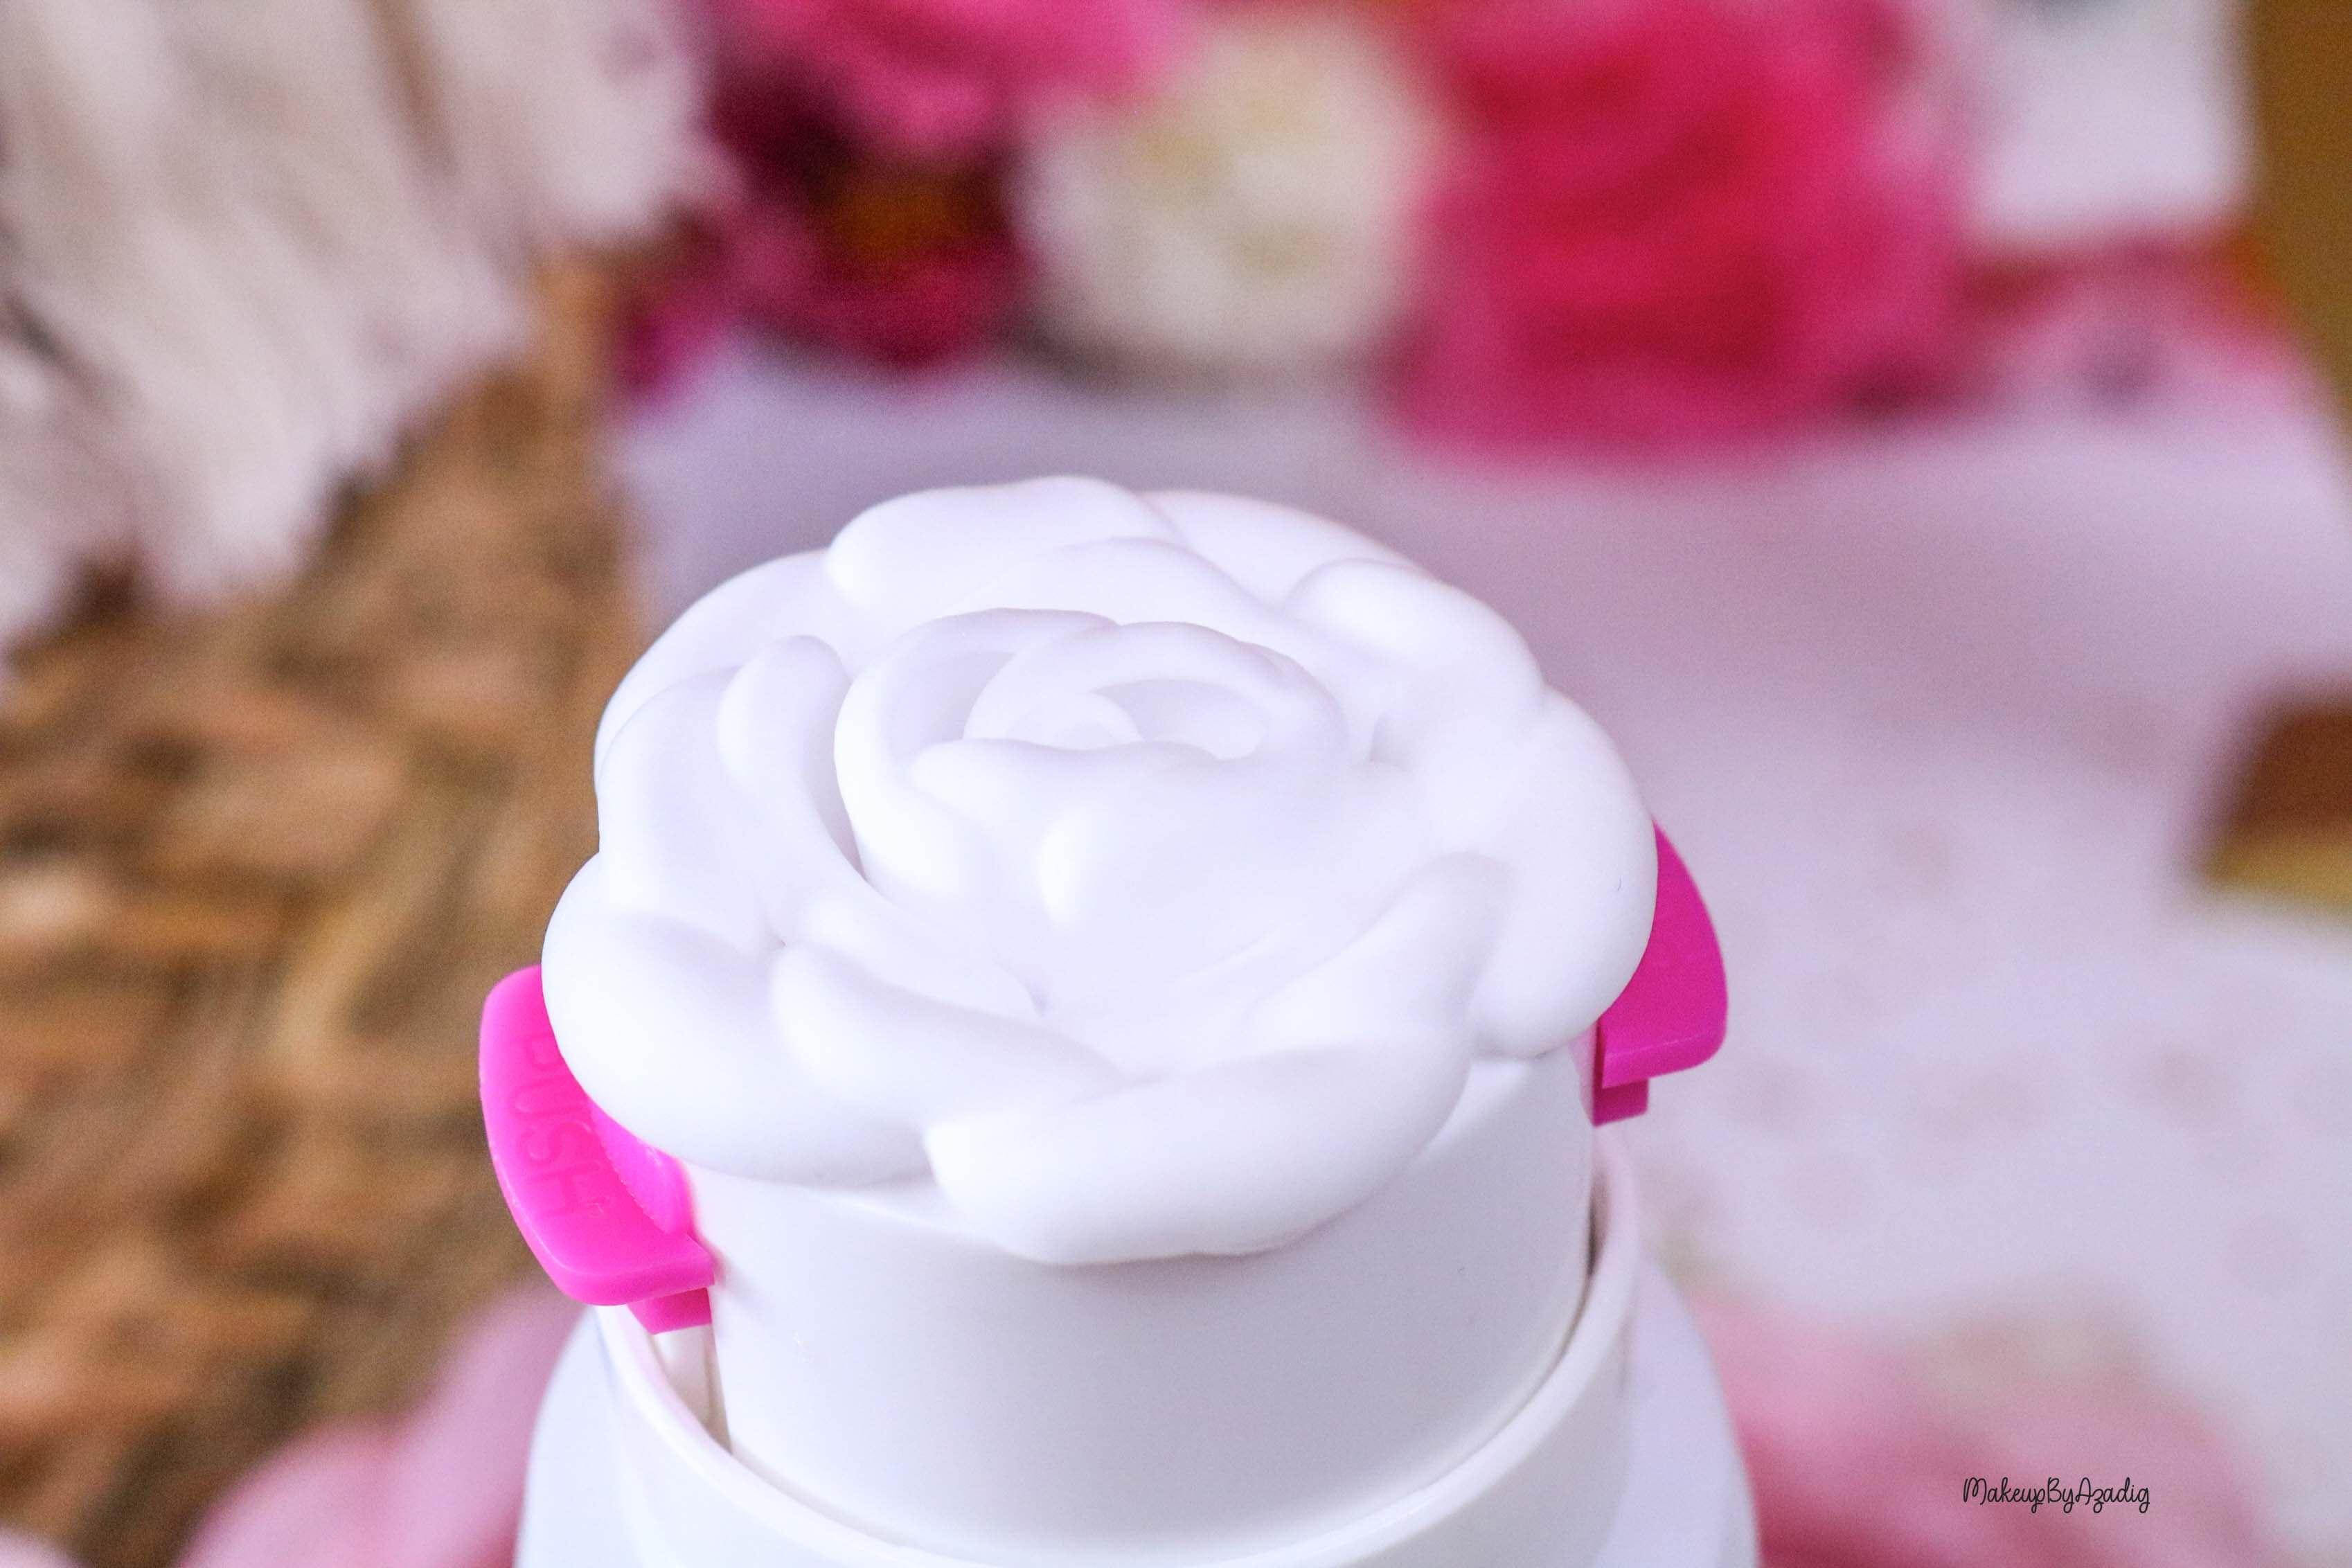 gel-douche-mousse-rituals-shower-flower-foam-ritual-hoi-makeupbyazadig-avis-prix-sephora-france-magique